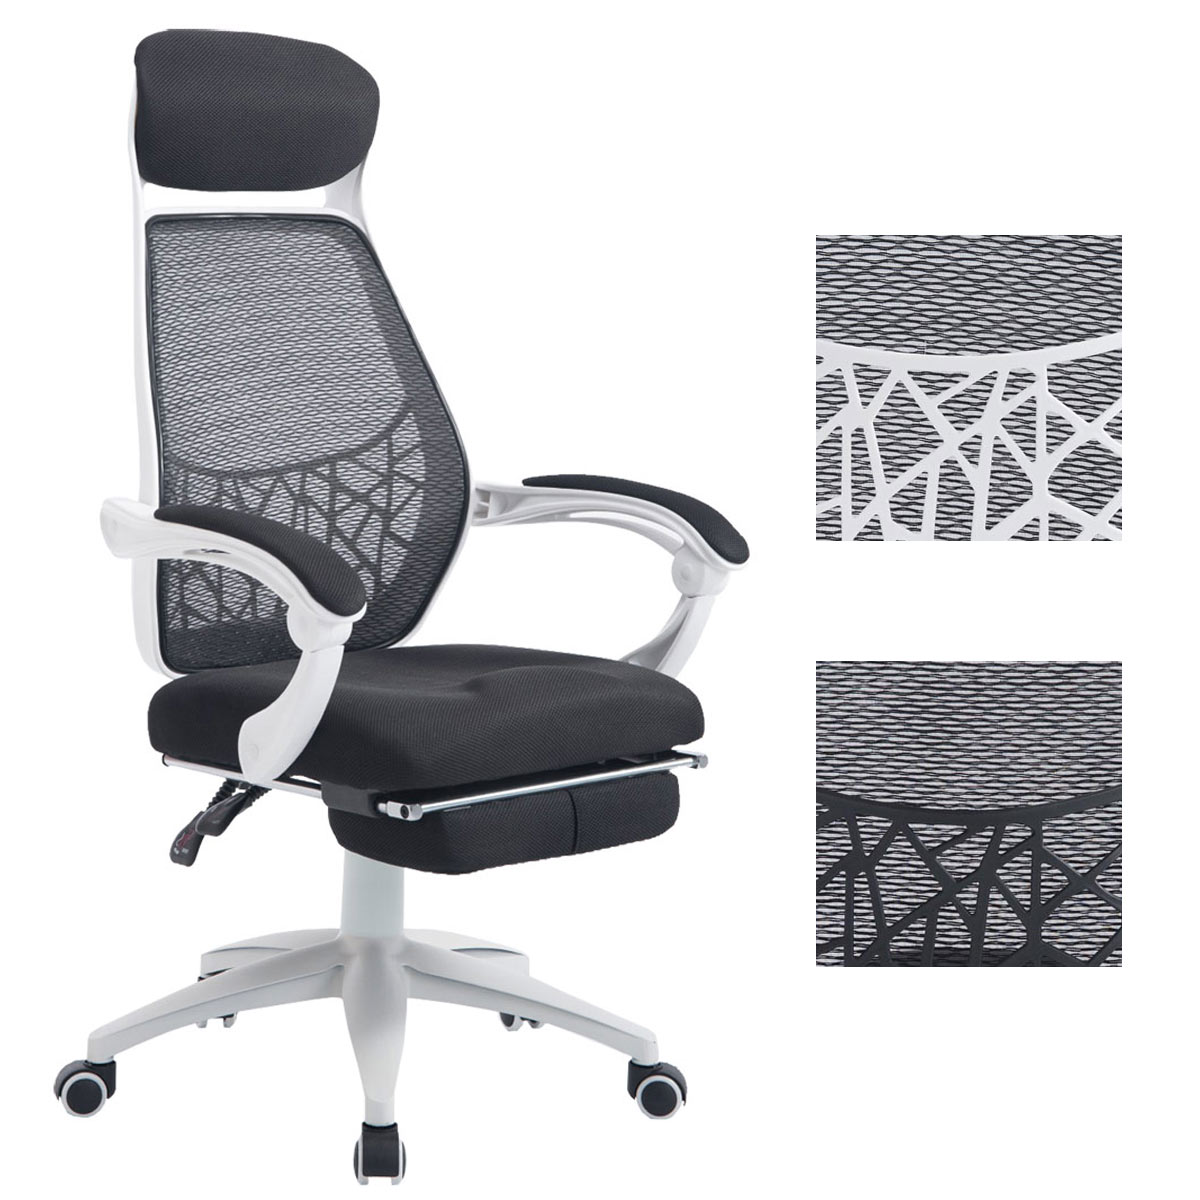 b rostuhl marcel netzbezug schreibtischstuhl drehstuhl mit fu ablage relaxsessel ebay. Black Bedroom Furniture Sets. Home Design Ideas